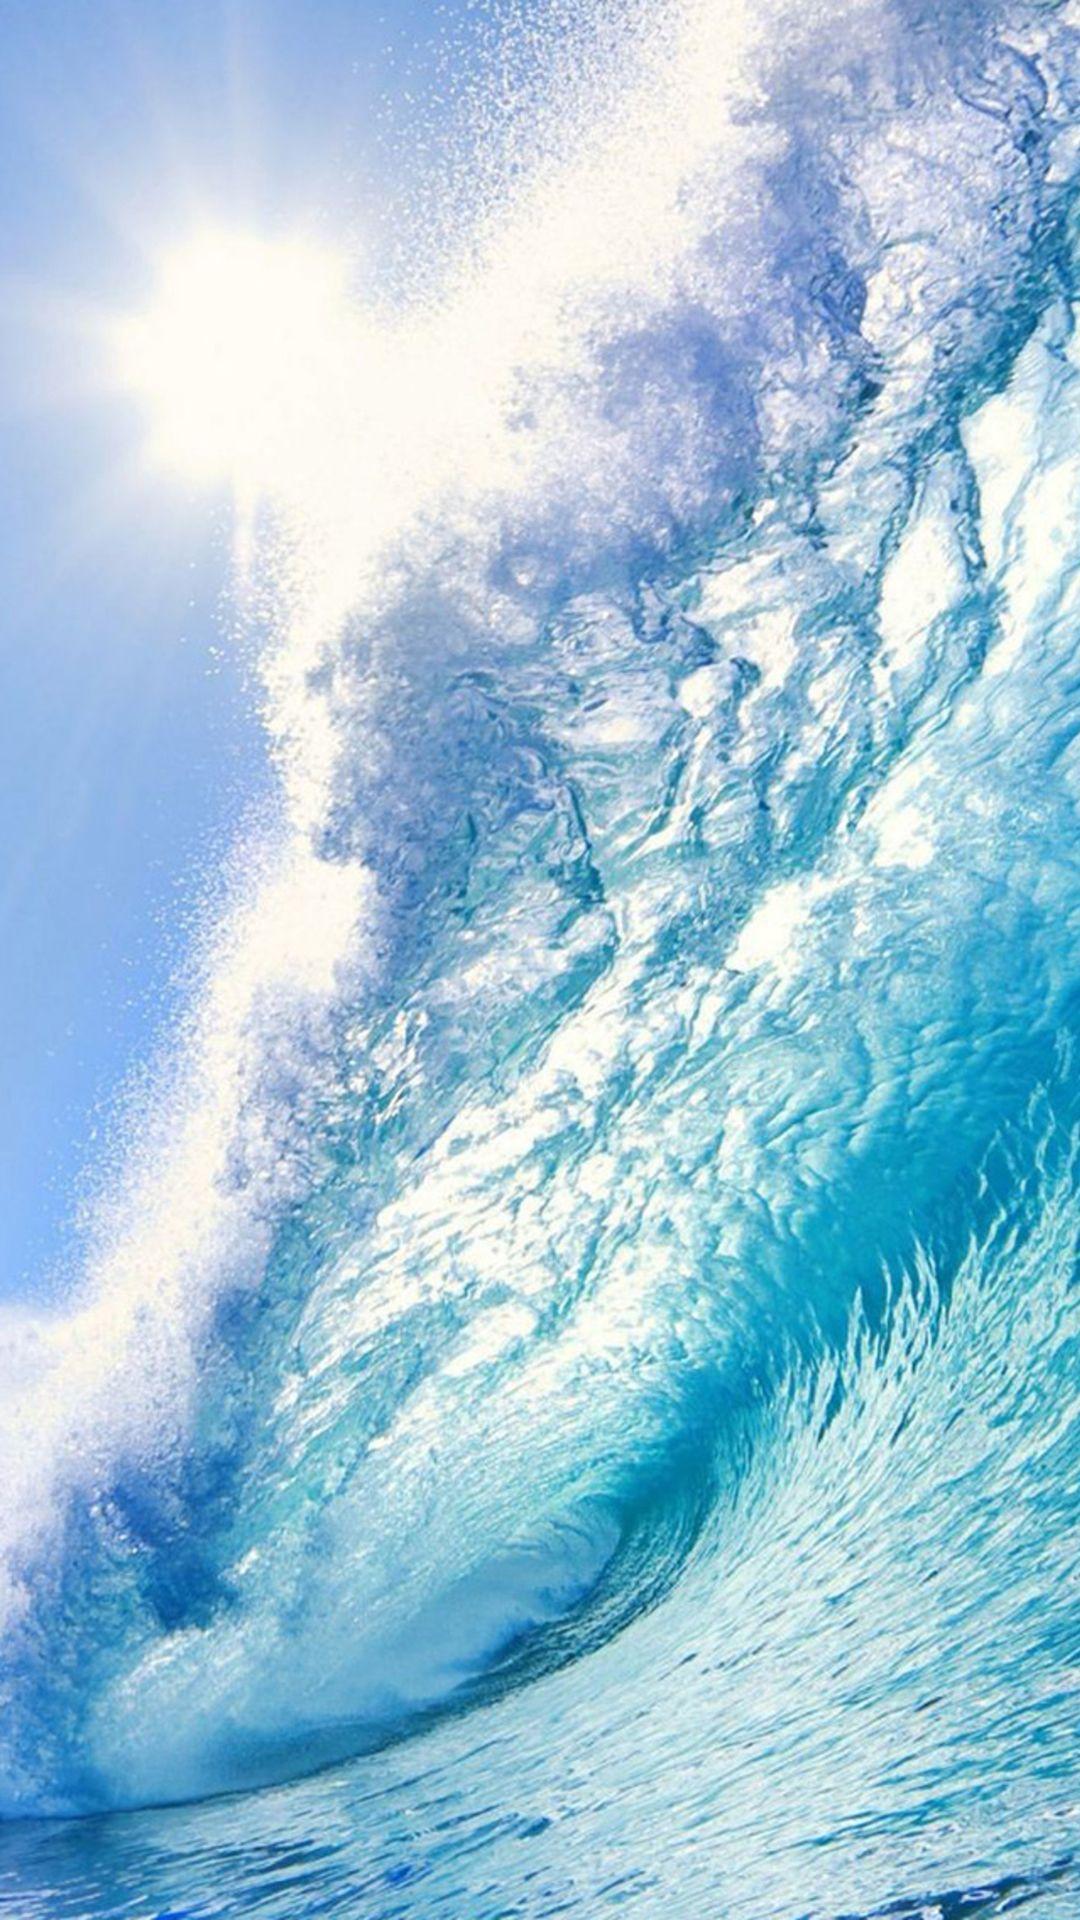 Wallpaper iphone wave - Nature Huge Ocean Surging Wave Under Sunshine Iphone 6 Plus Wallpaper